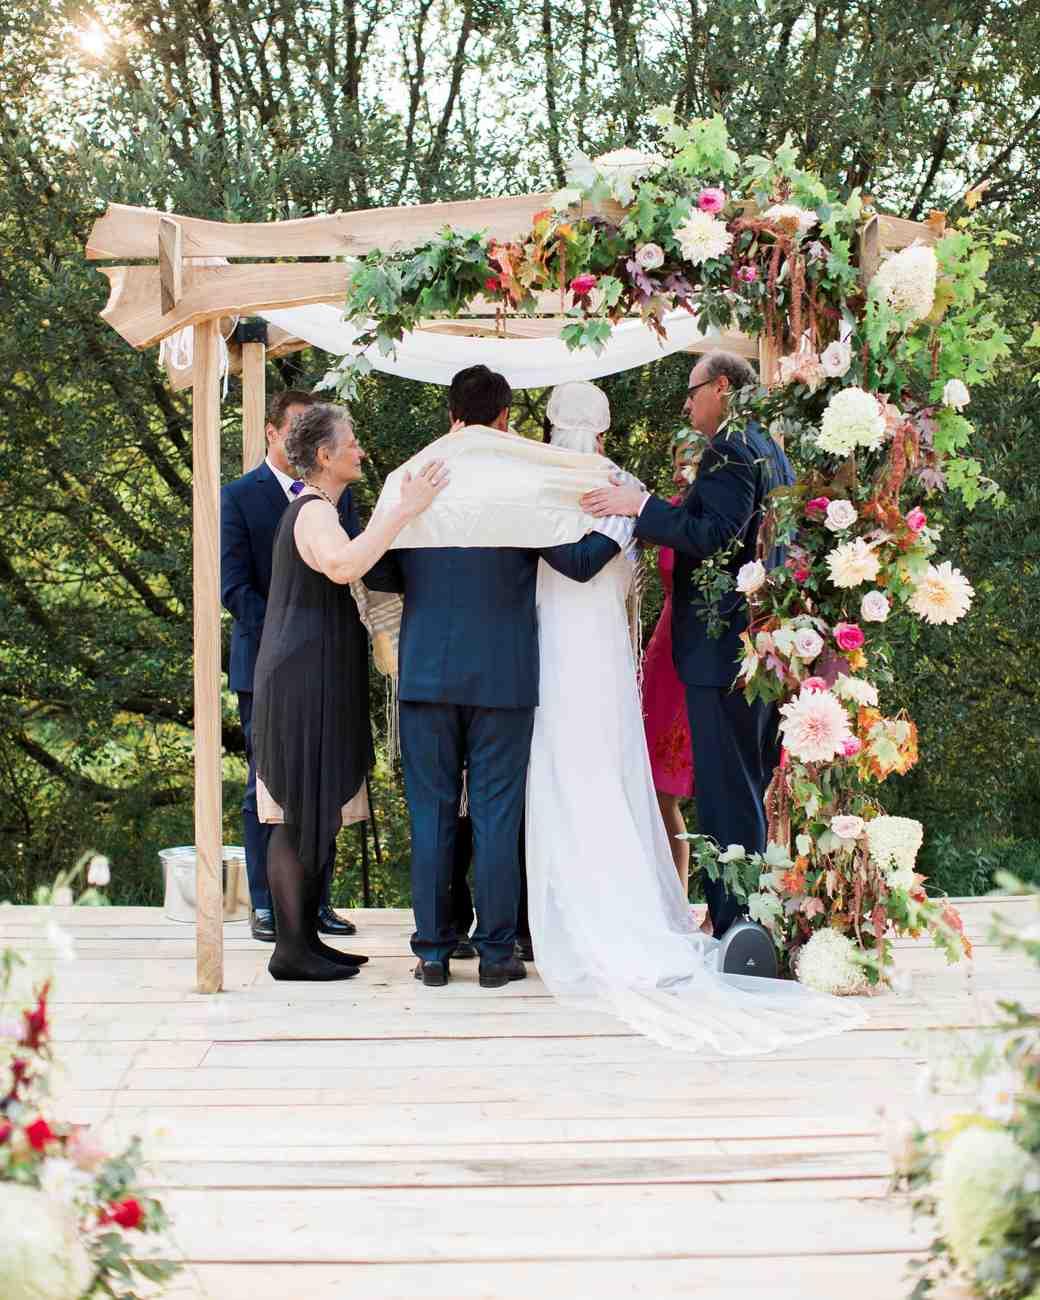 kayla michael wedding ceremony family